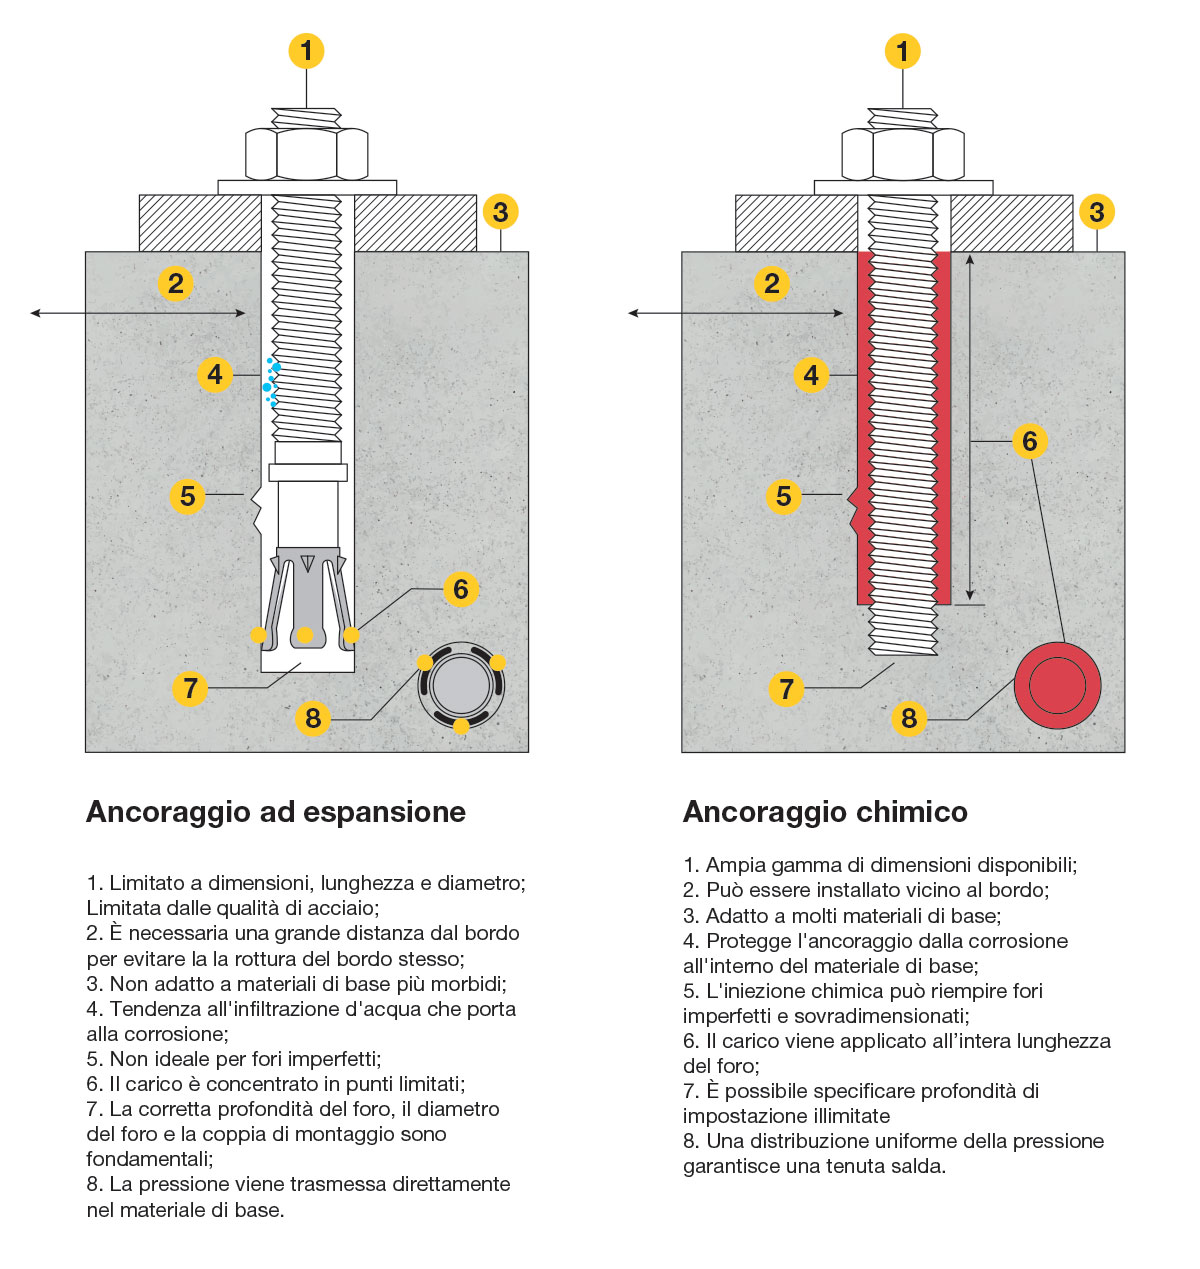 Tasselli chimici vs tasselli ad espansione